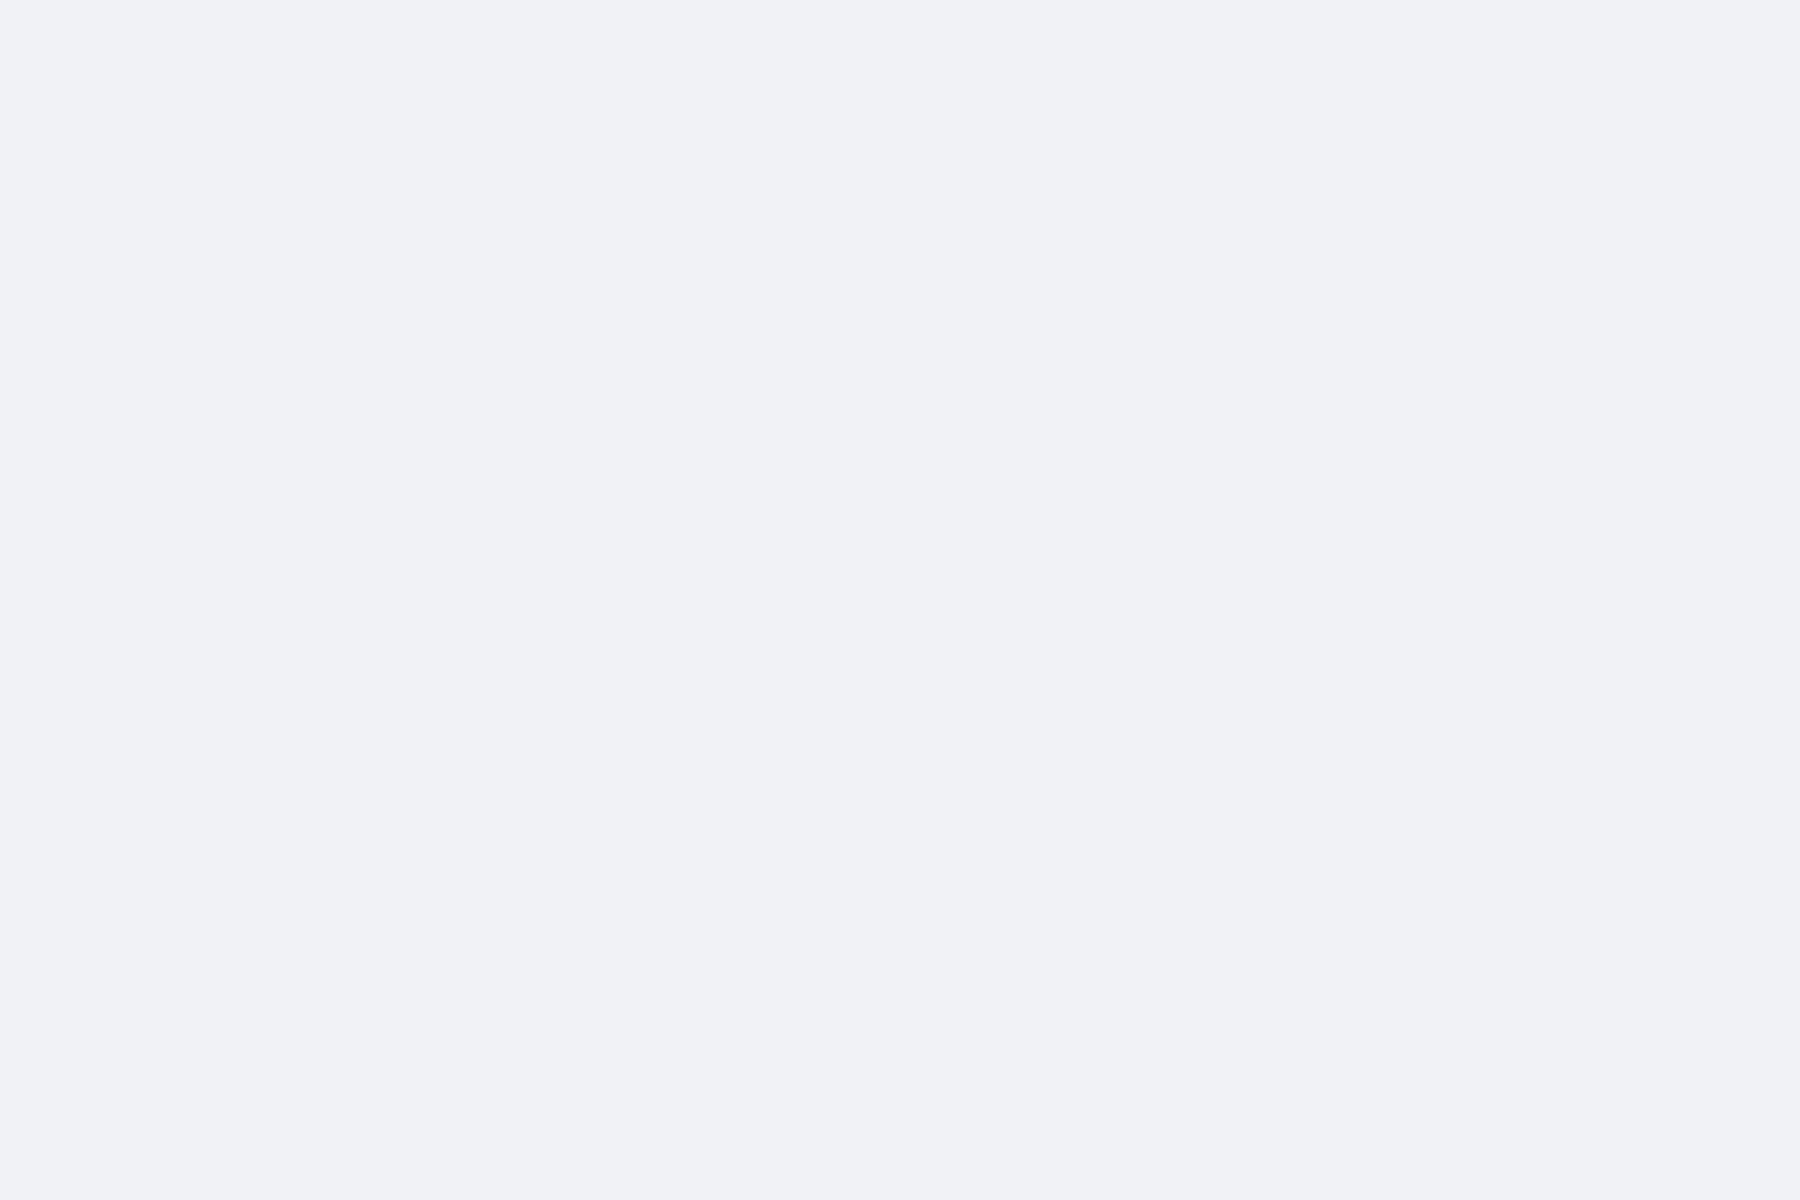 Mount kochen Web-Kamera